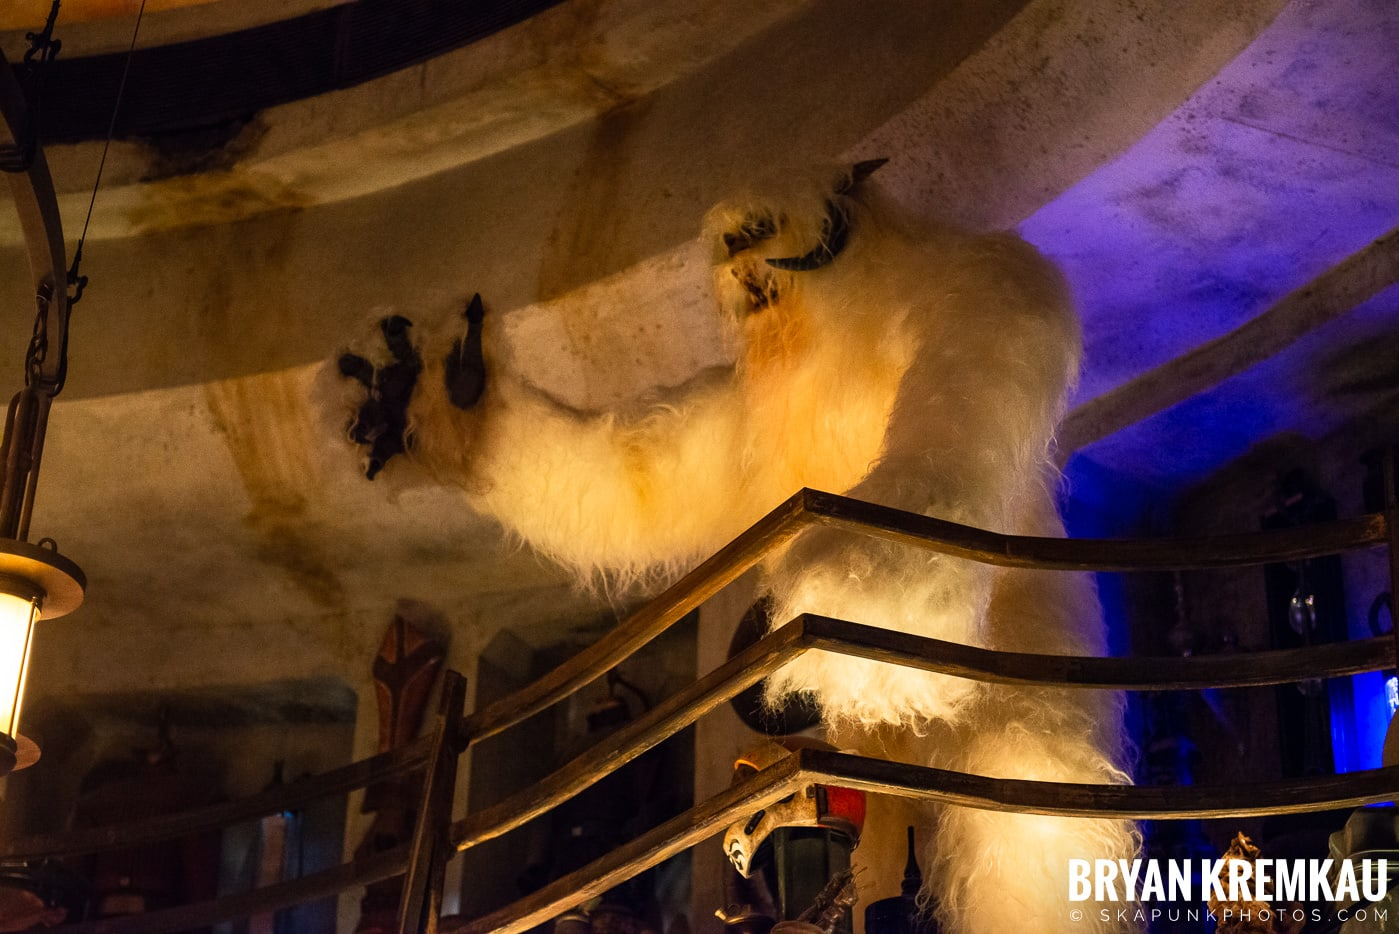 Walt Disney World Vacation: Day 5 (Animal Kingdom / Disney's Hollywood Studios) - 10.3.19 (27)